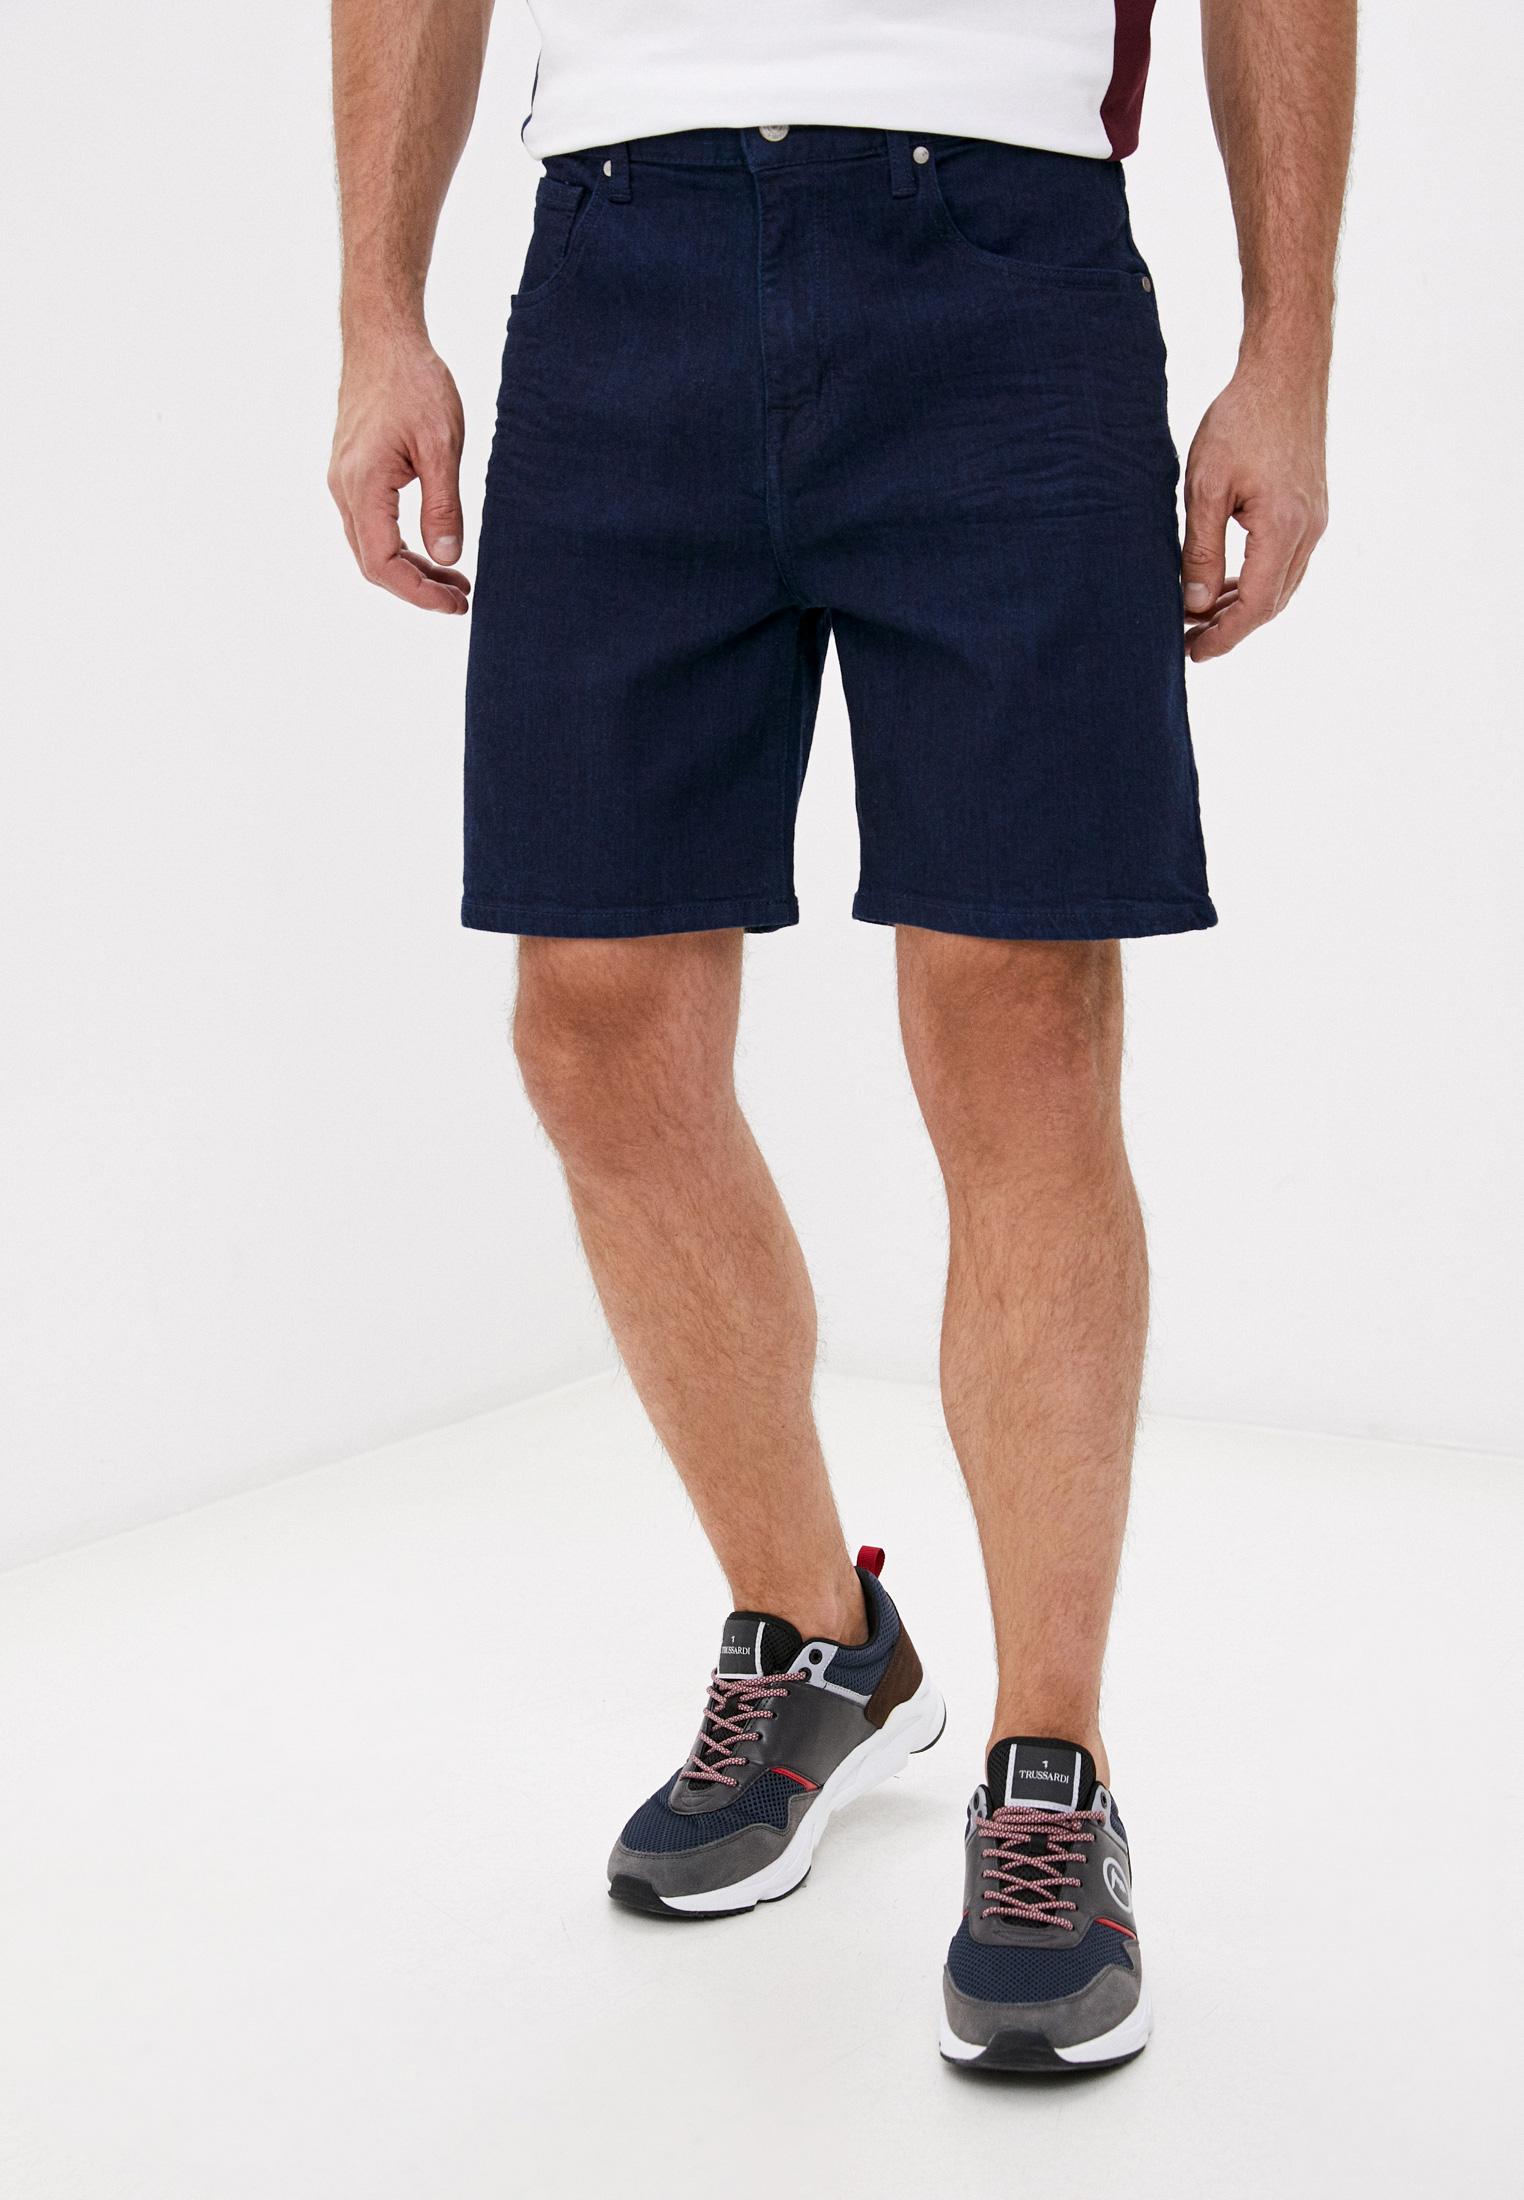 Мужские джинсовые шорты Armani Exchange 6ZZS28 Z1GFZ